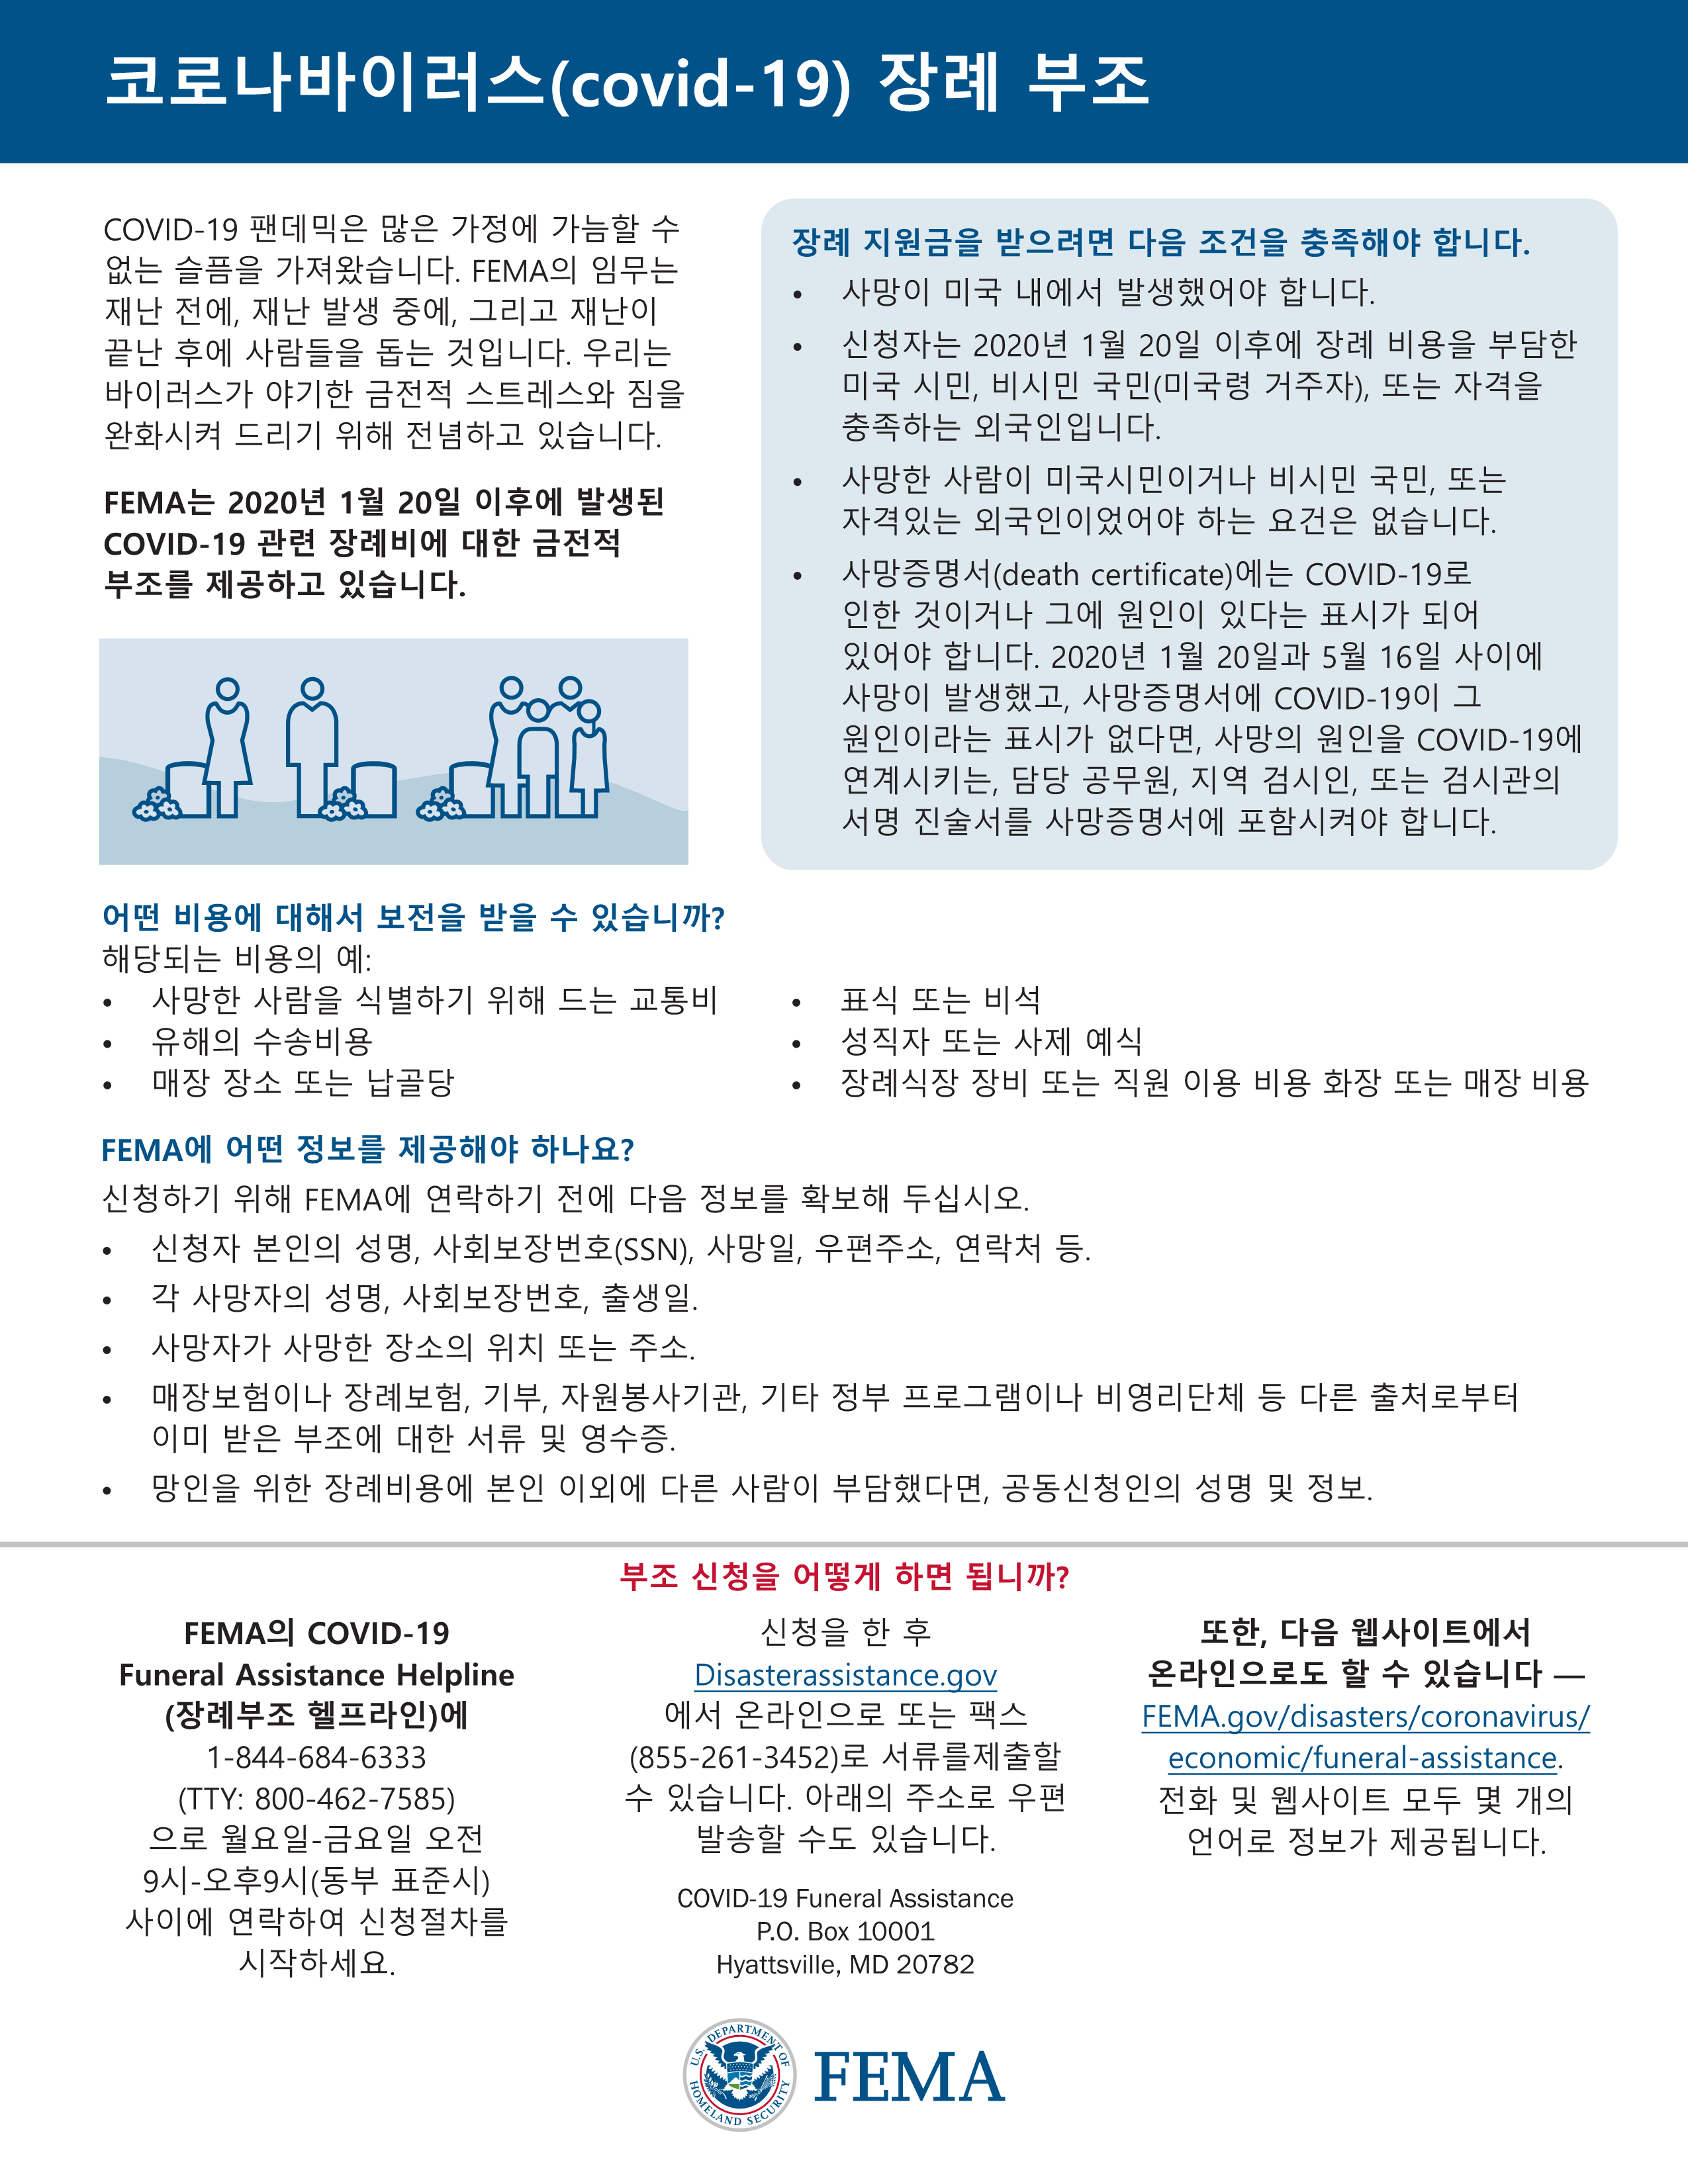 fema_korean-funeral-assistance-flyer_1.png